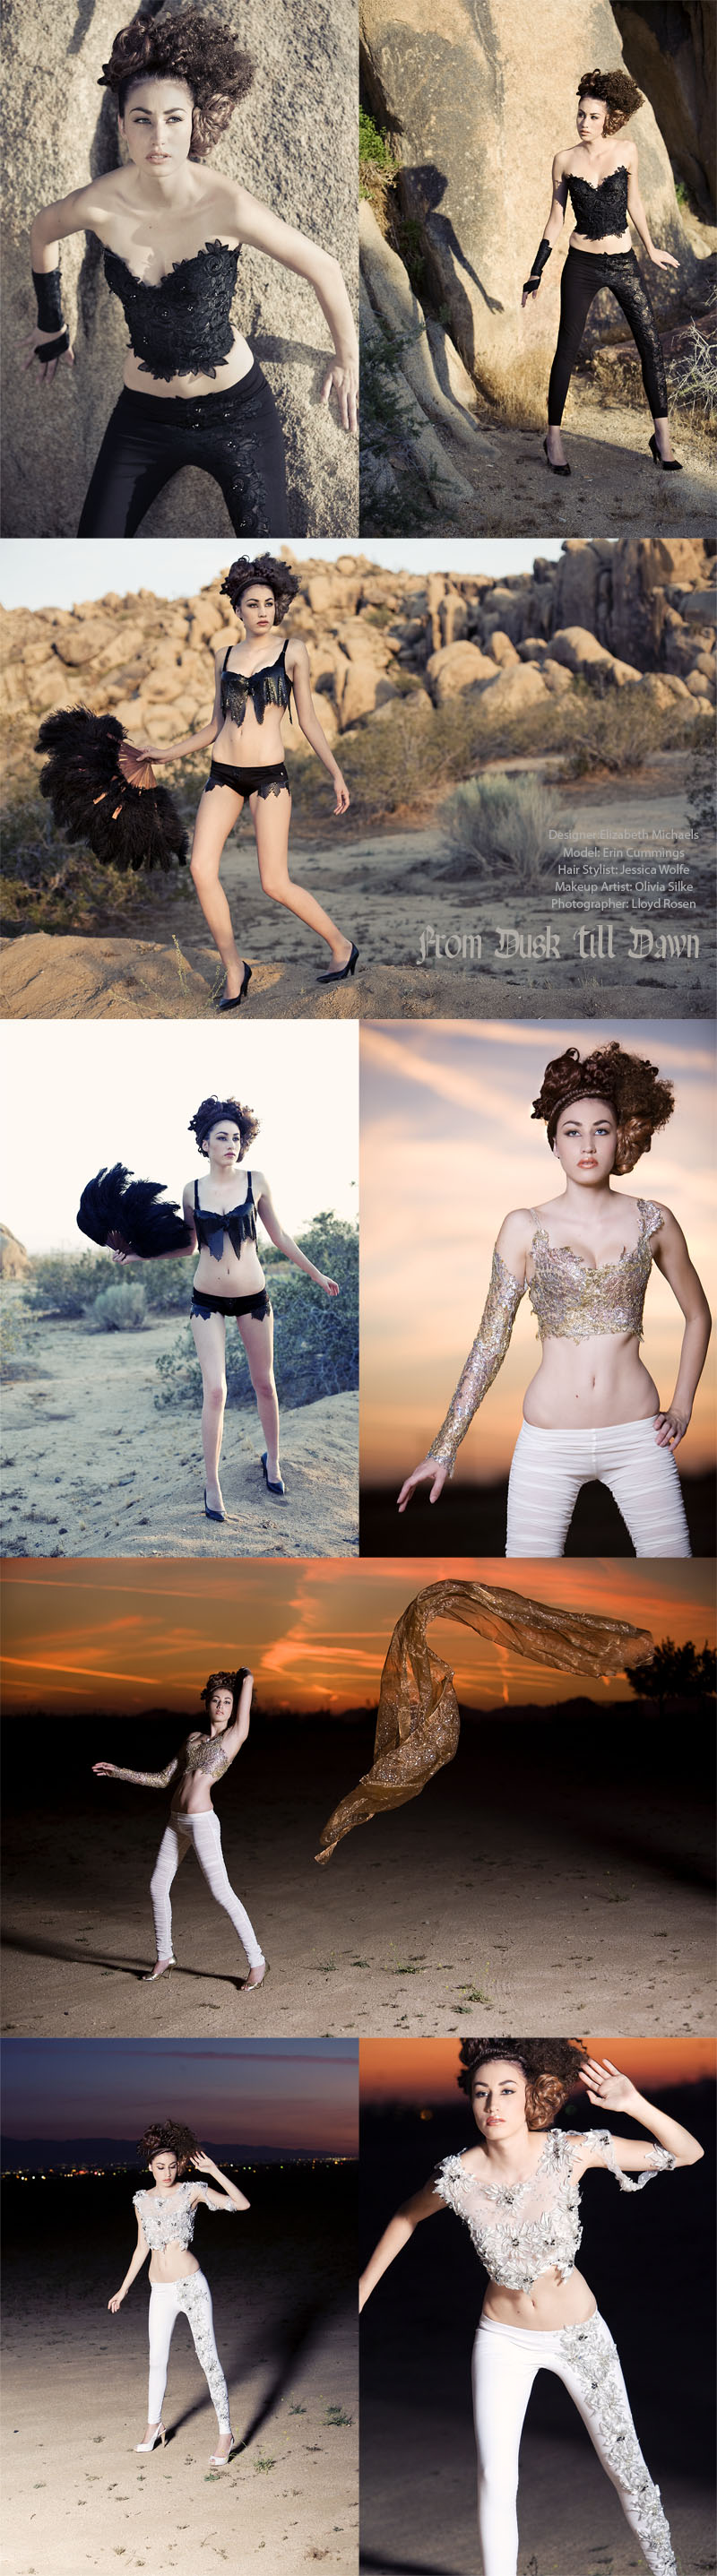 the desert Jul 12, 2008 Lloyd Rosen Photography From Dusk till Dawn..............Haute Couture spec